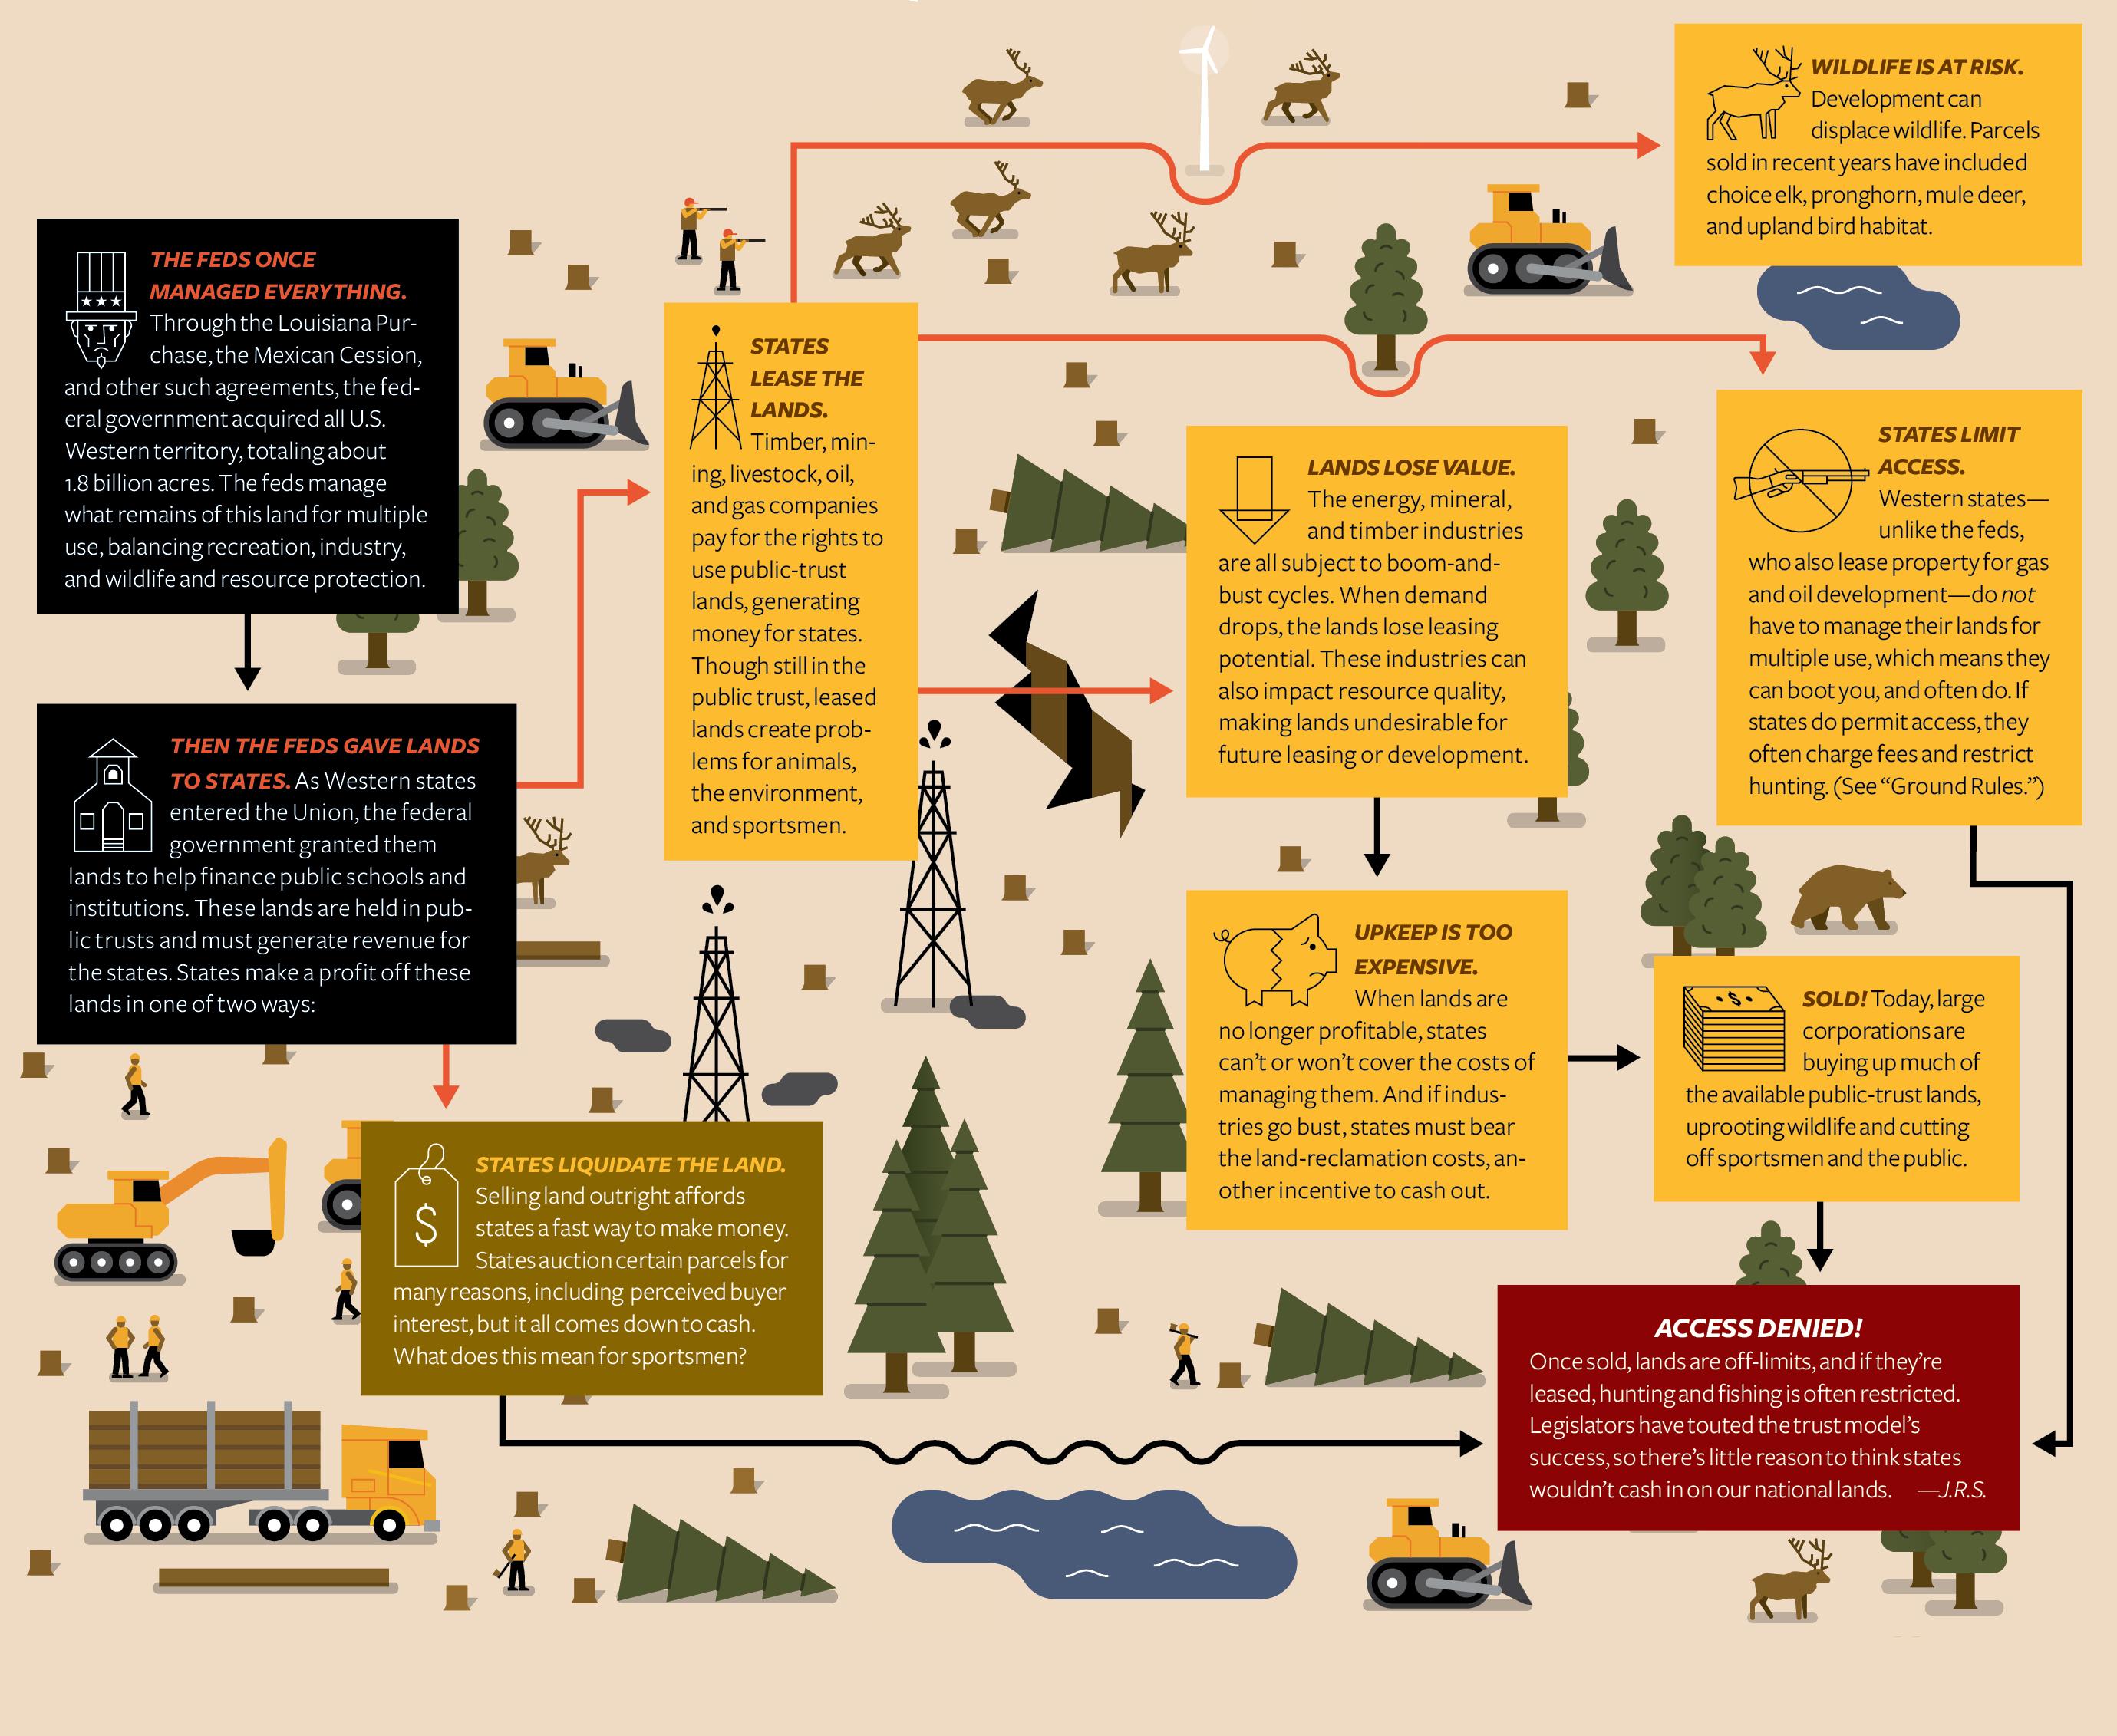 The Battle Over Public Lands | Field & Stream